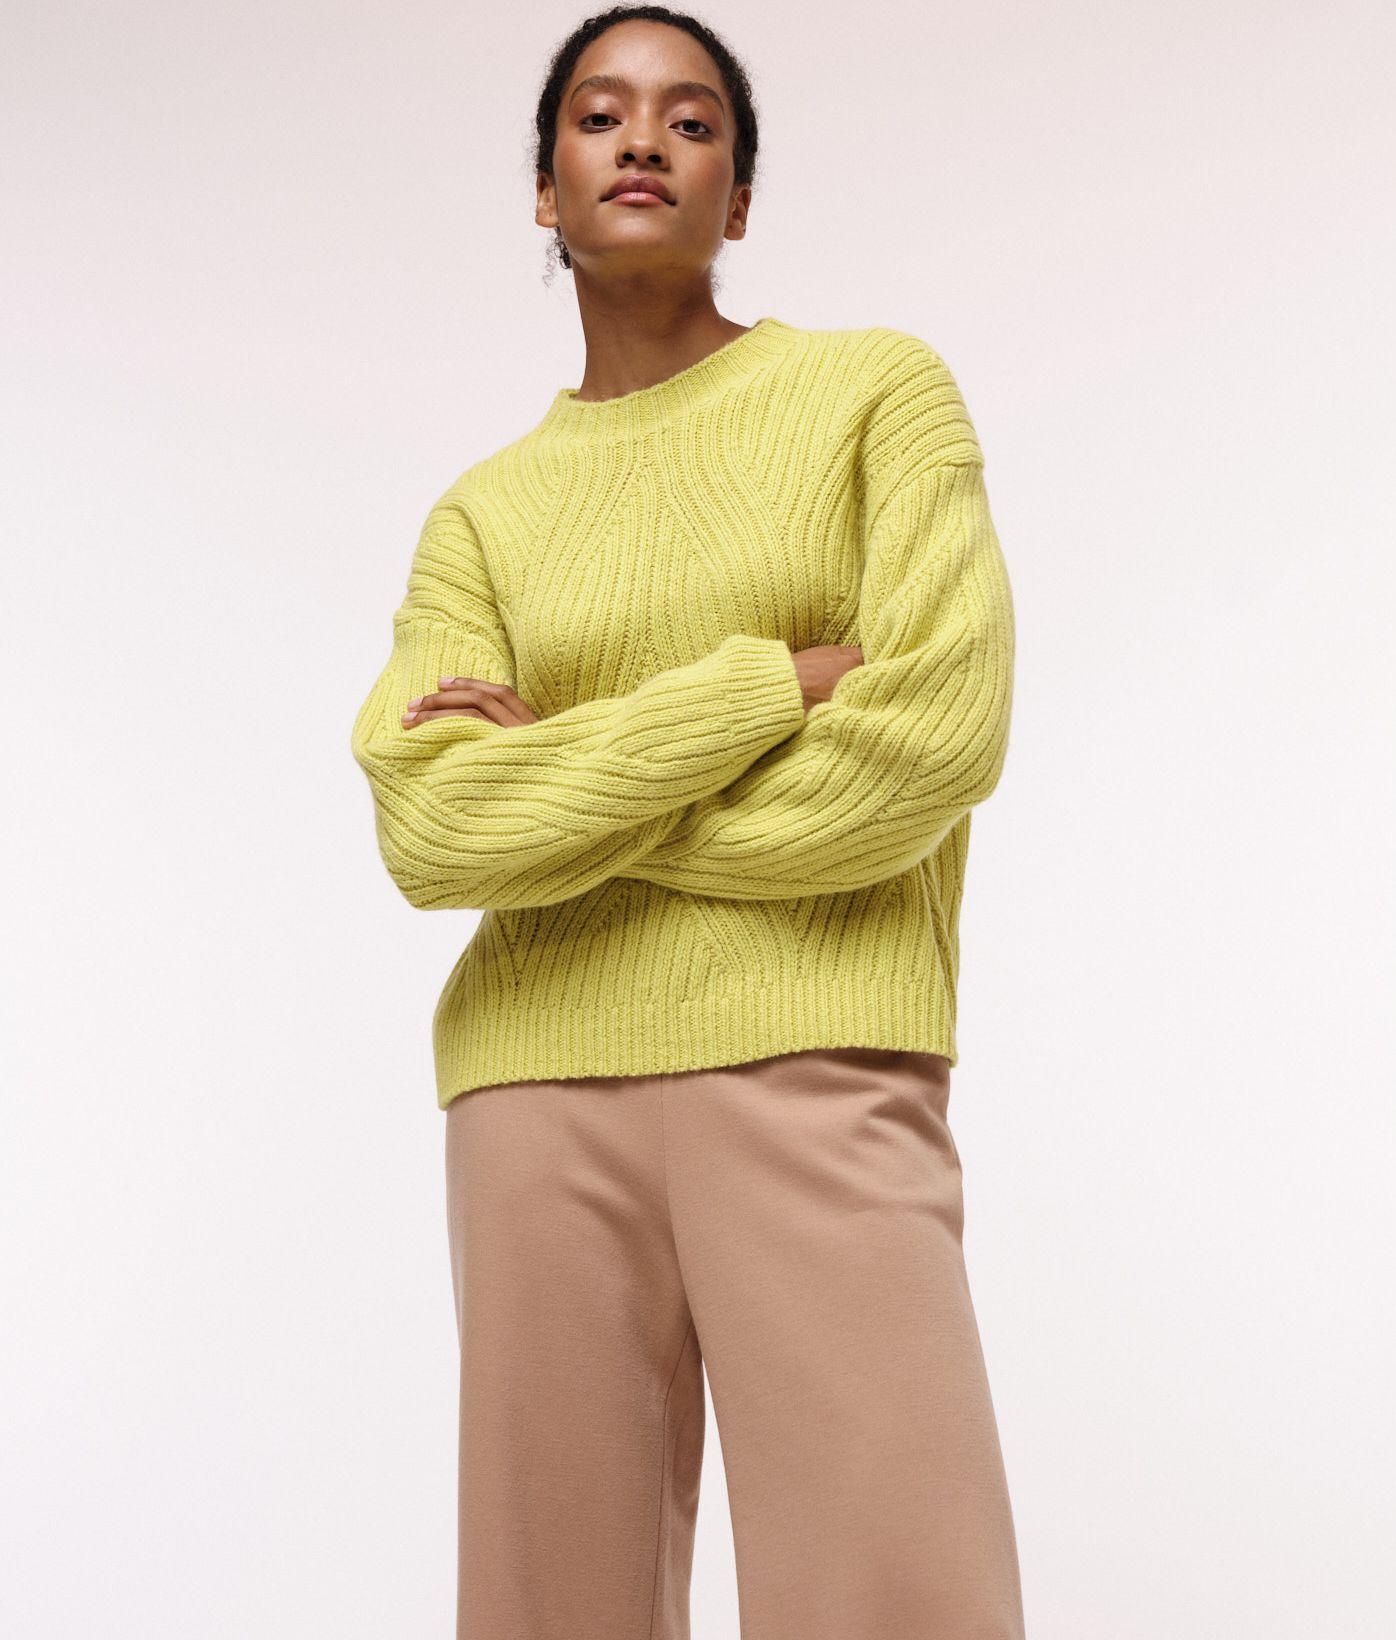 Damen-Pullover mit Rippenzopfmuster neon yellow